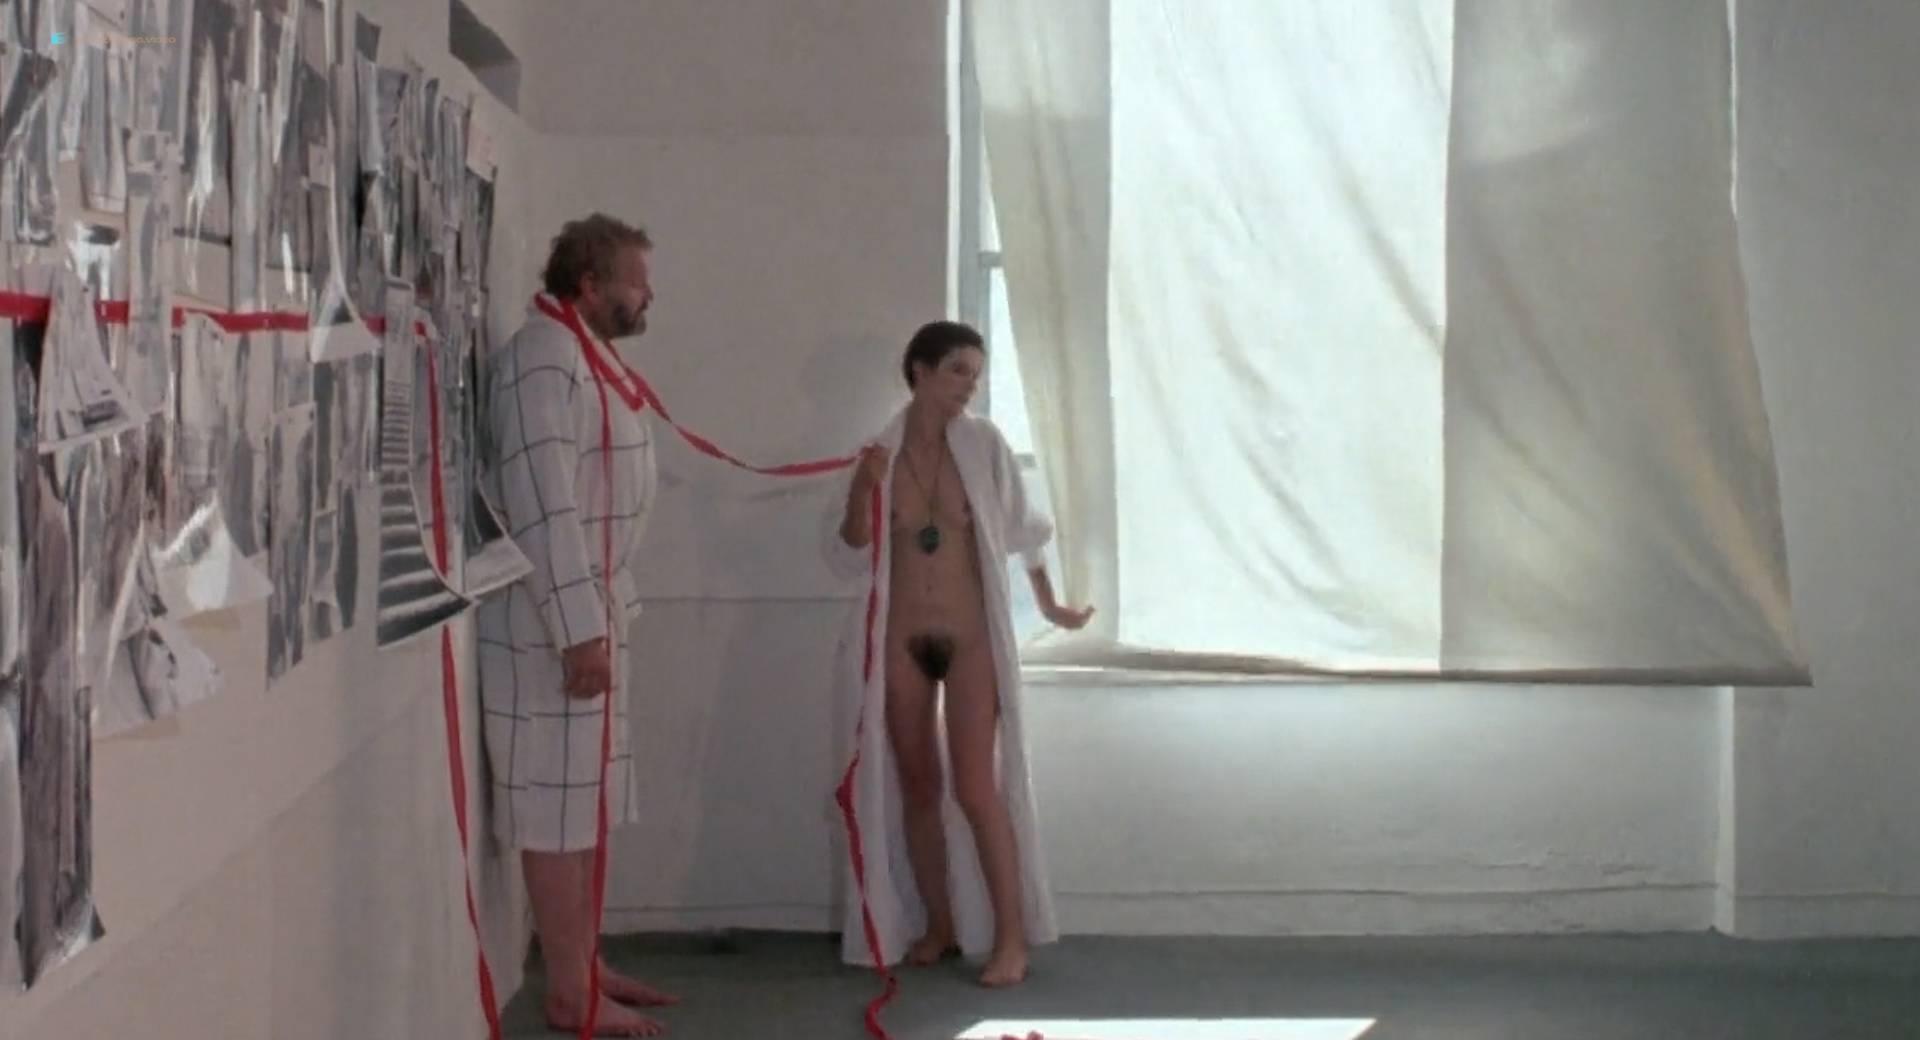 Free chloe webb nude pics sex photo